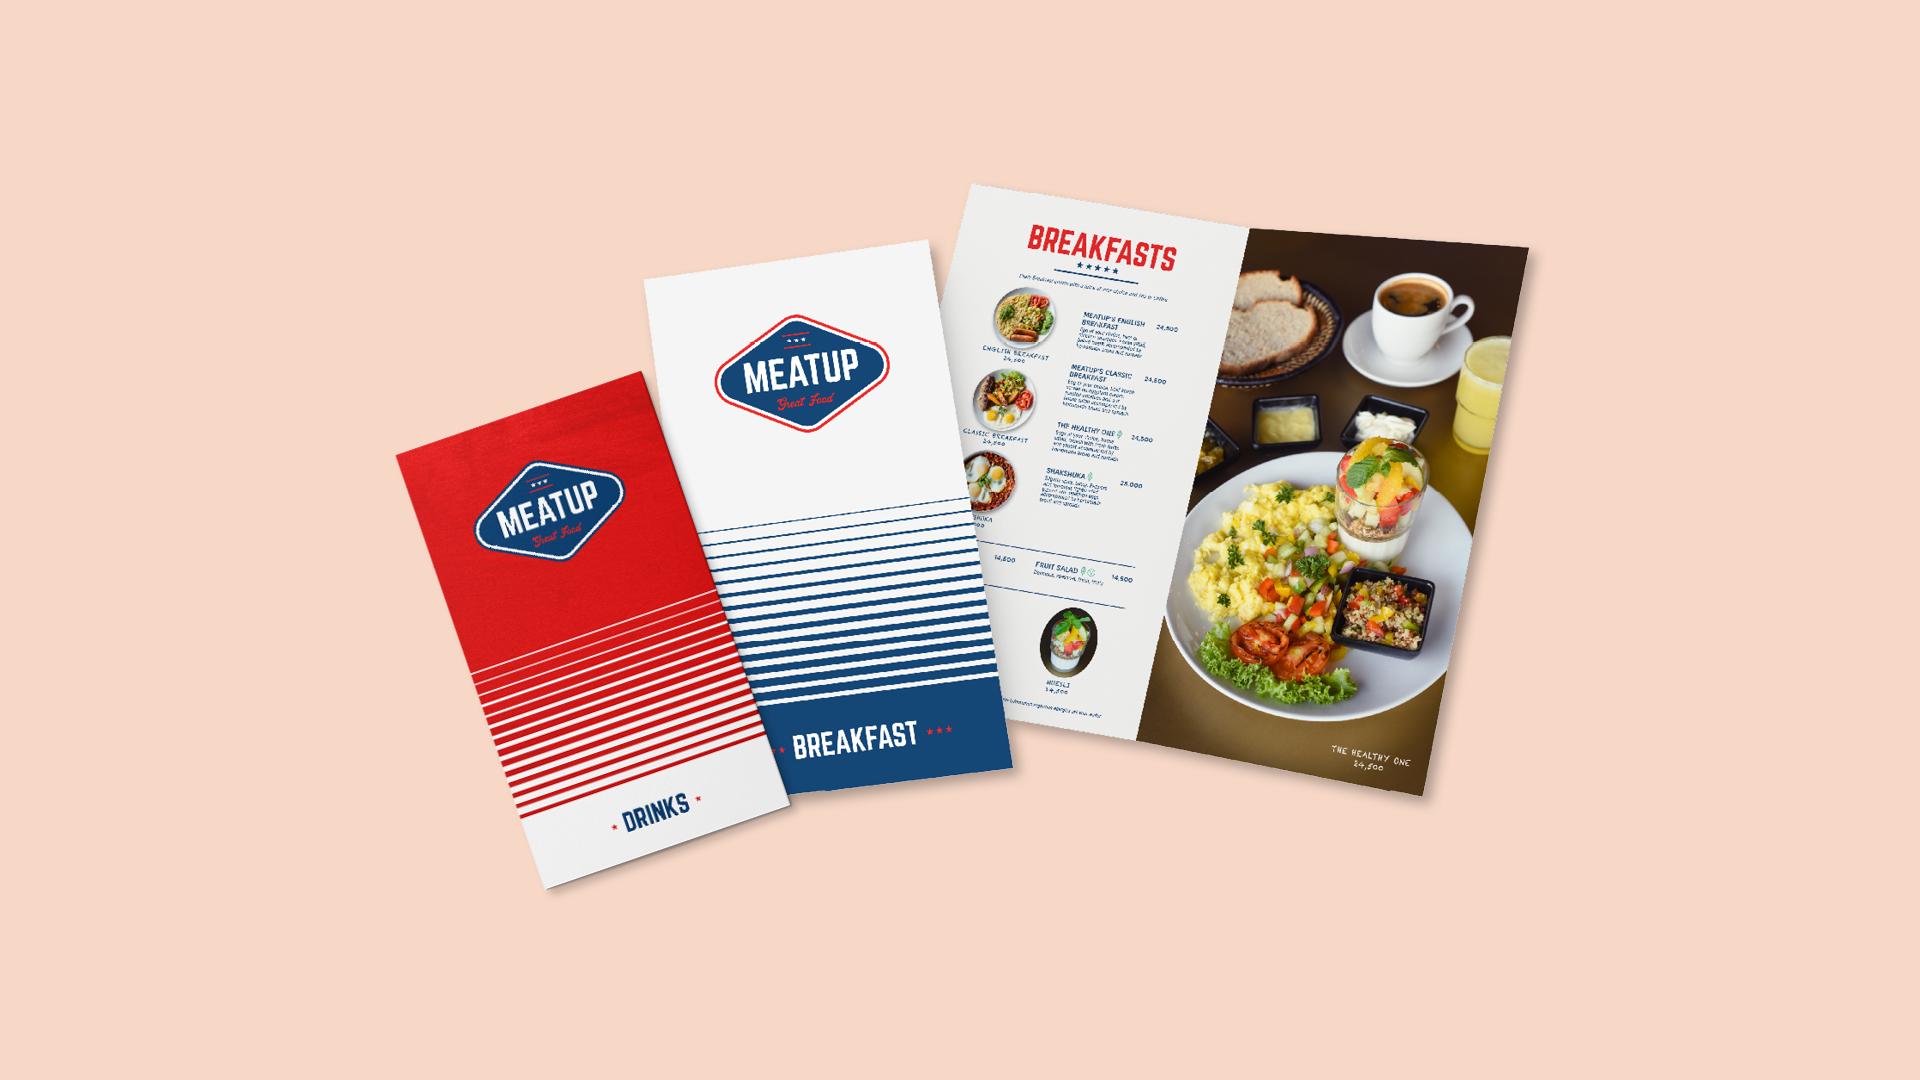 Meatup menu